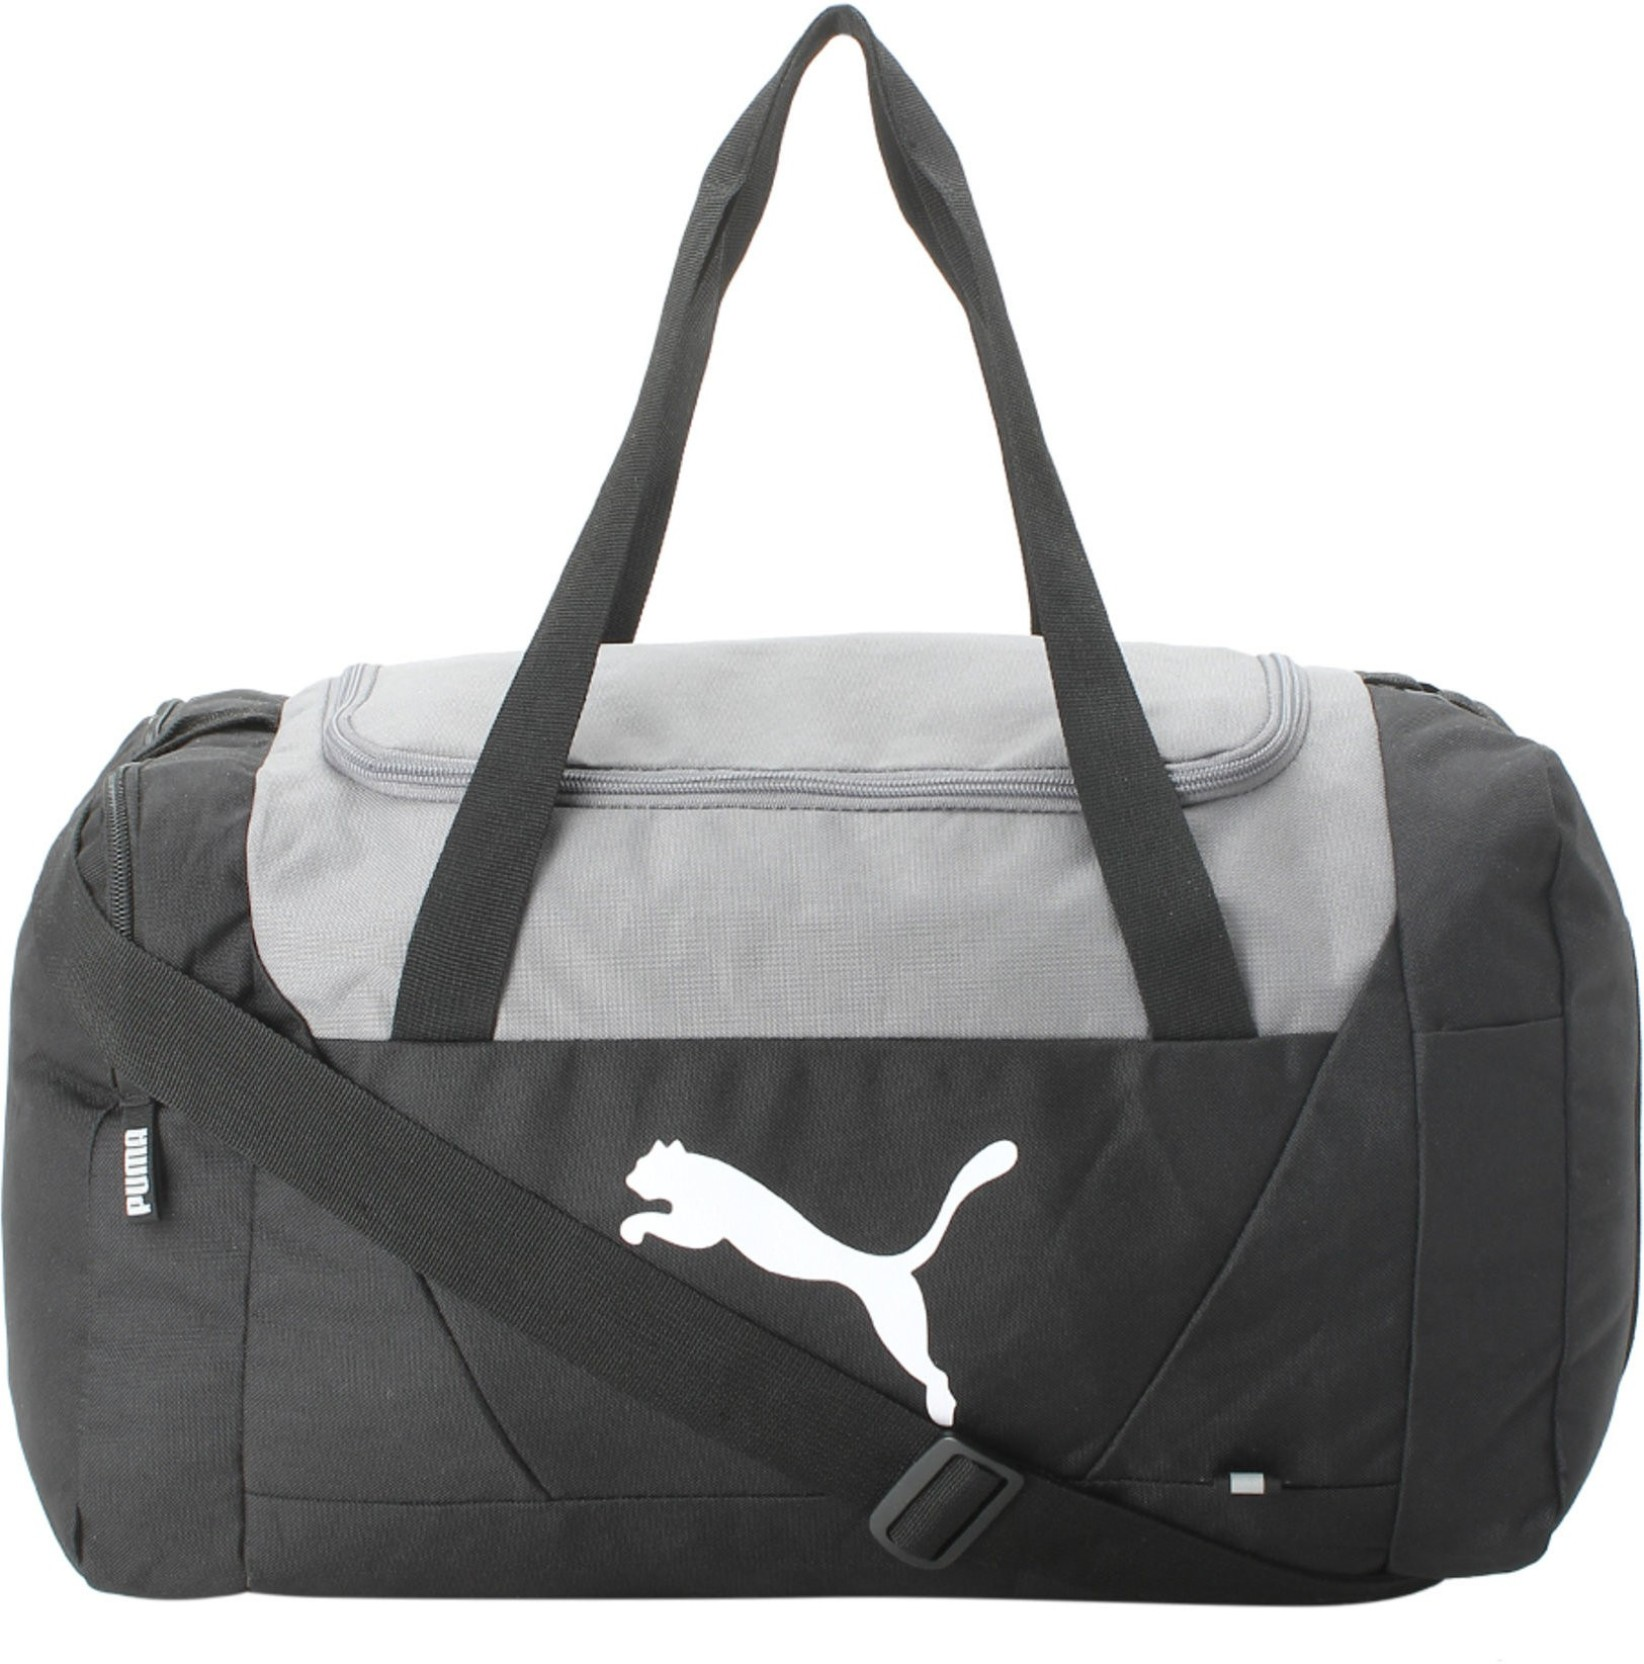 a587bd53ccd Puma Black Fundamental Small Sports Bag